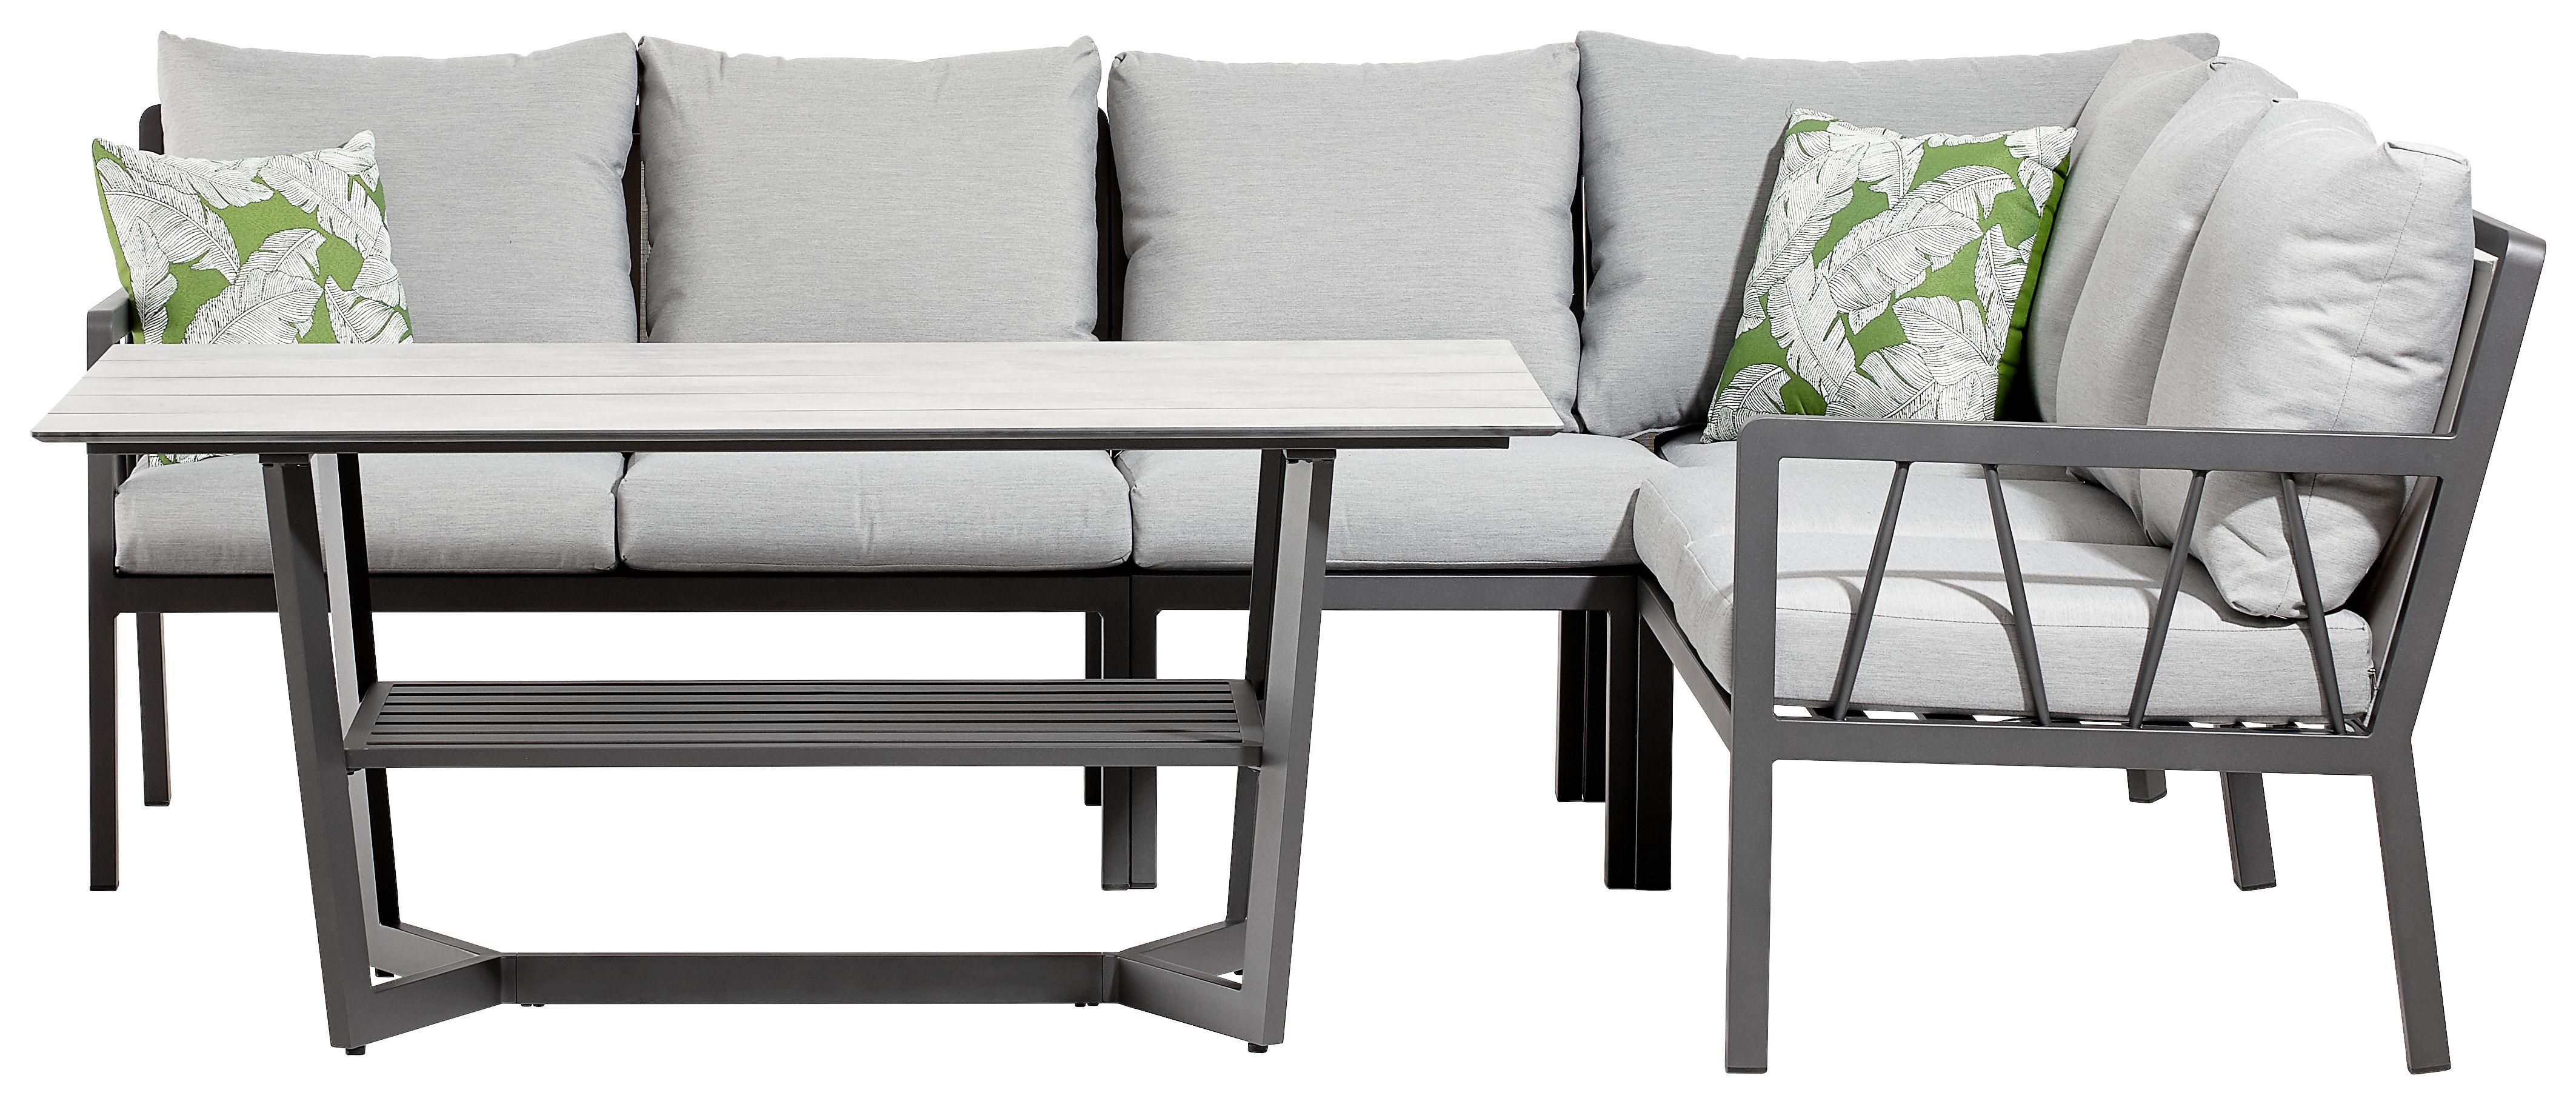 Lounge Sofa In L Form Mit Kissen Online Finden In 2021 Lounge Mobel Lounge Garnitur Lounge